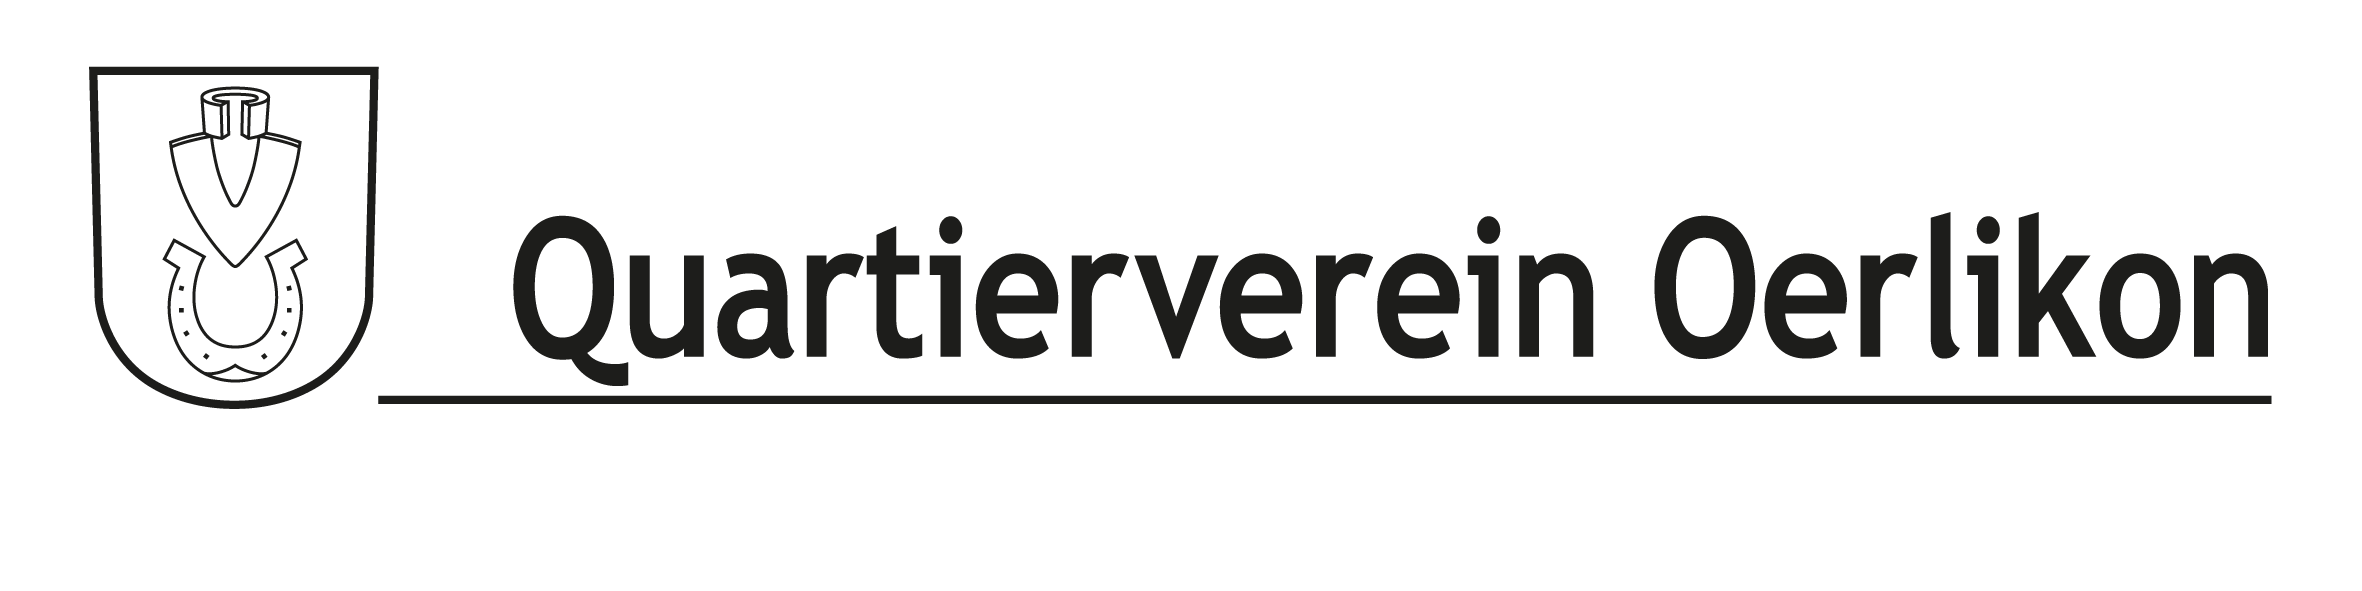 2018-qvOerlikon-logo-sw_4 (2).png